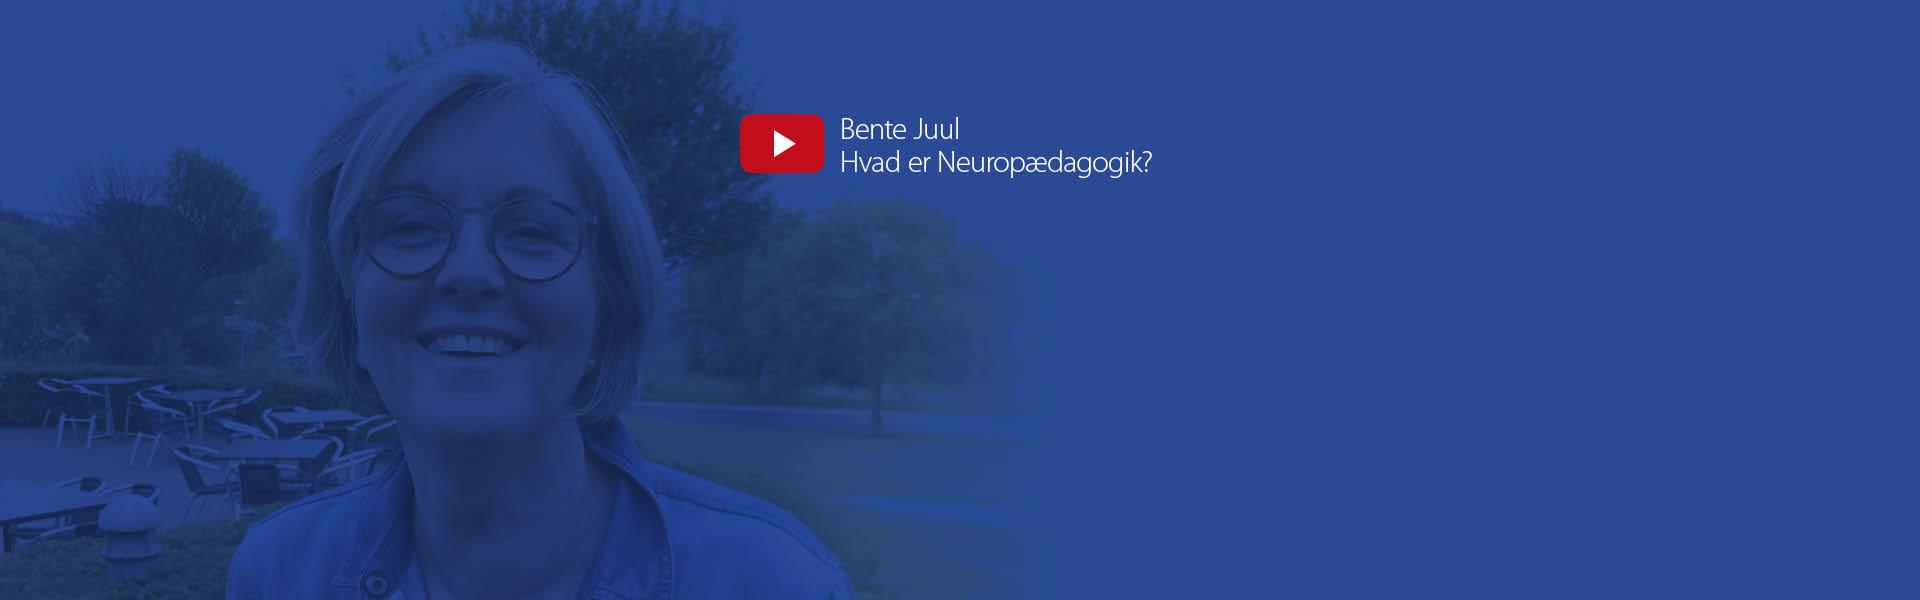 Videocover_1920x600px_Bente Juul_Hvad er Neuropædagogik?